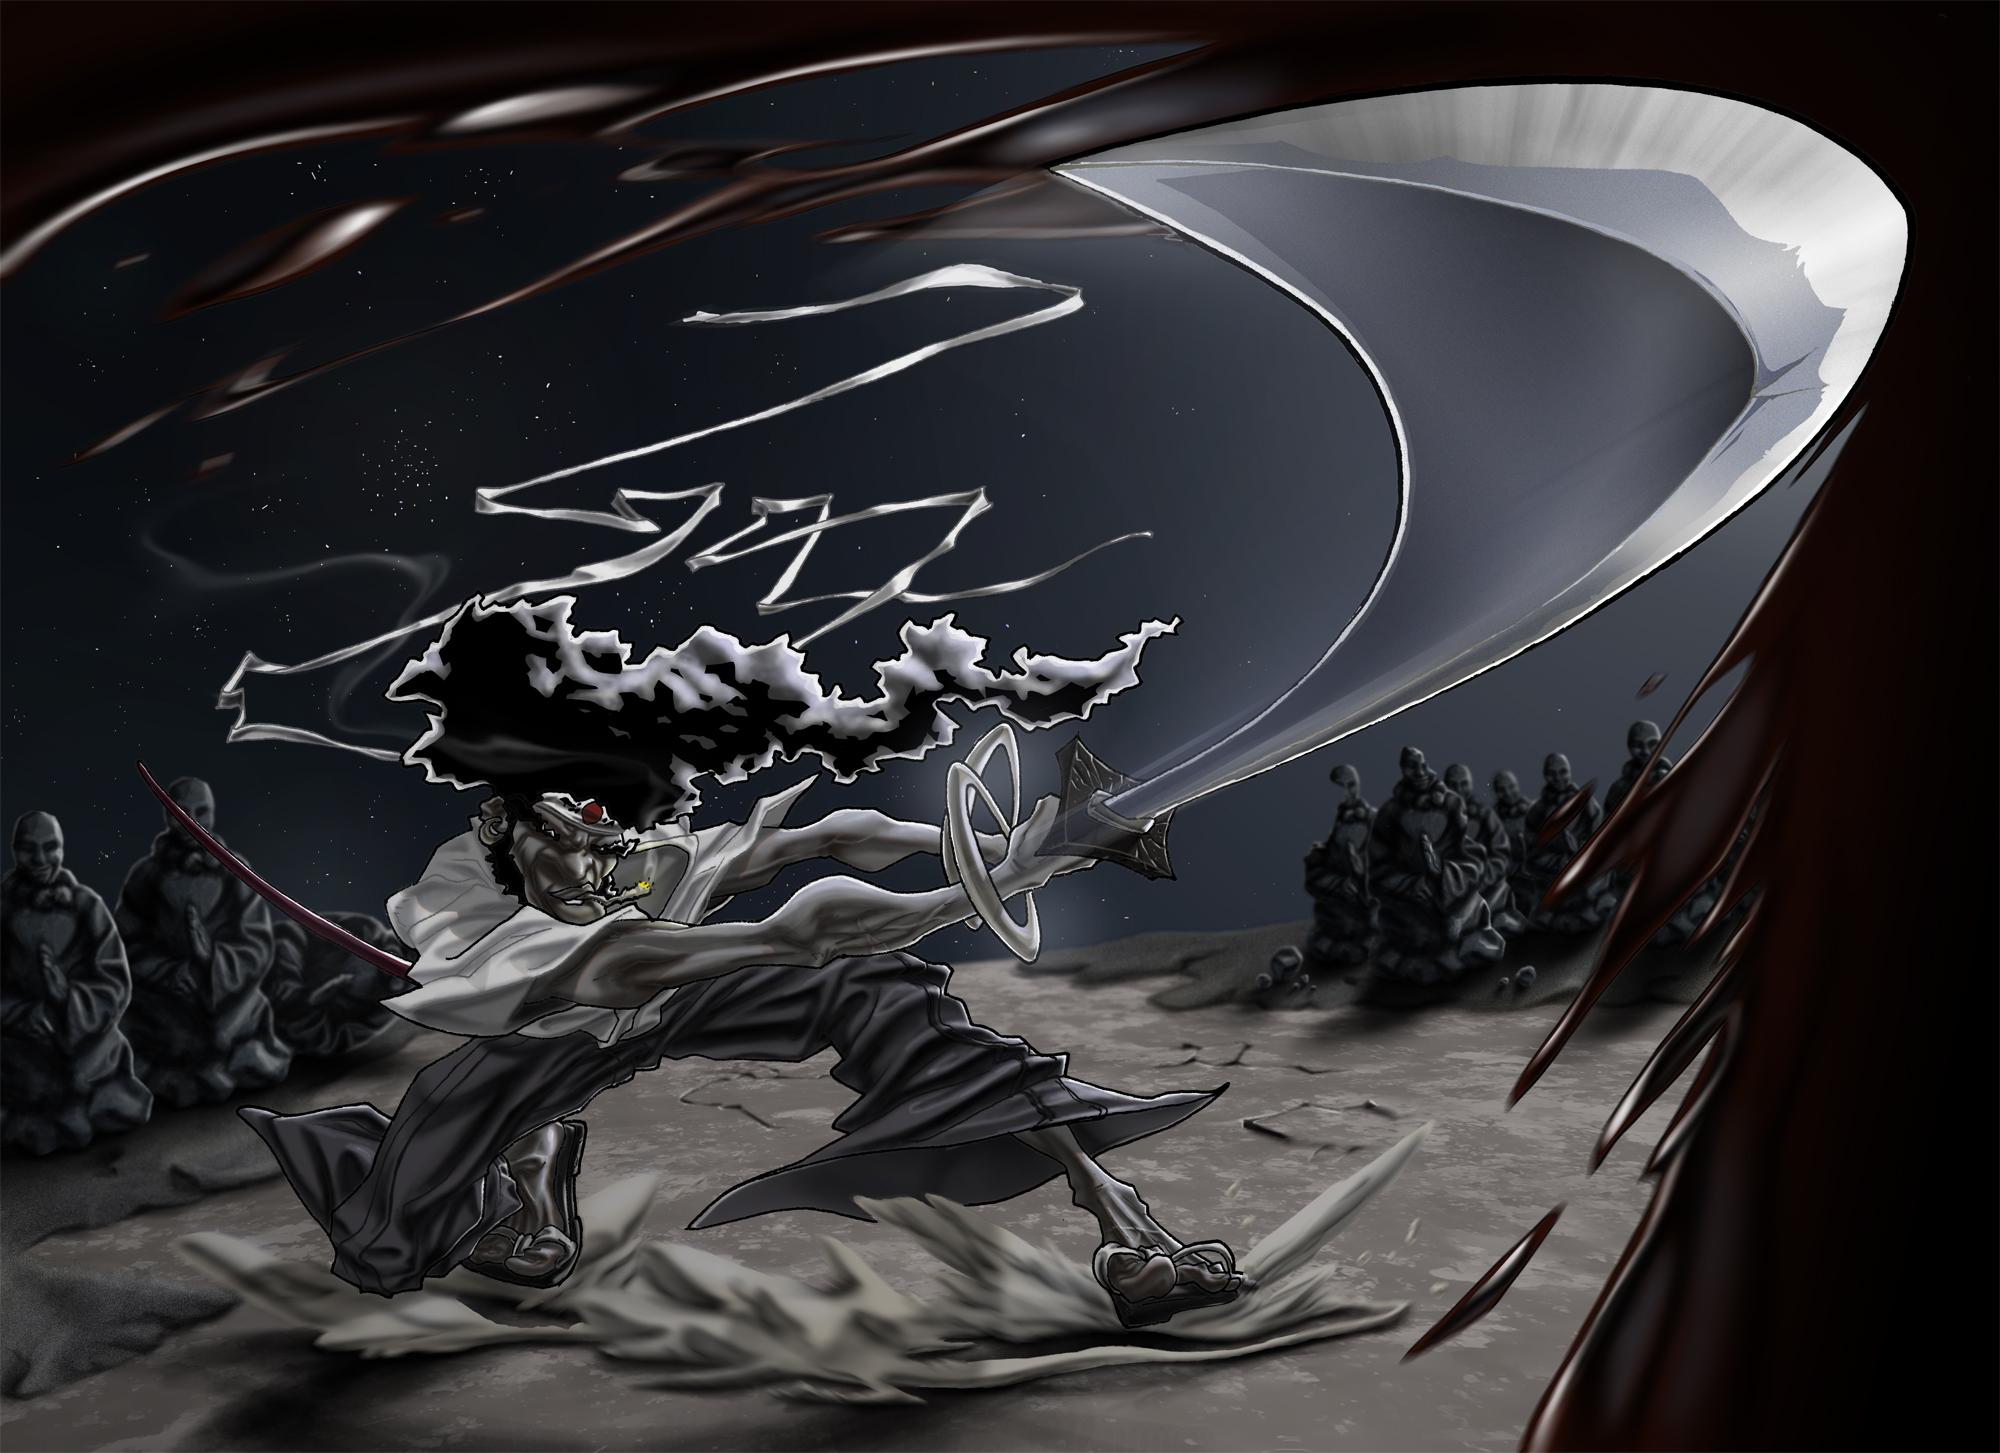 Afro Samurai Hd Wallpaper Background Image 2000x1453 Id 197556